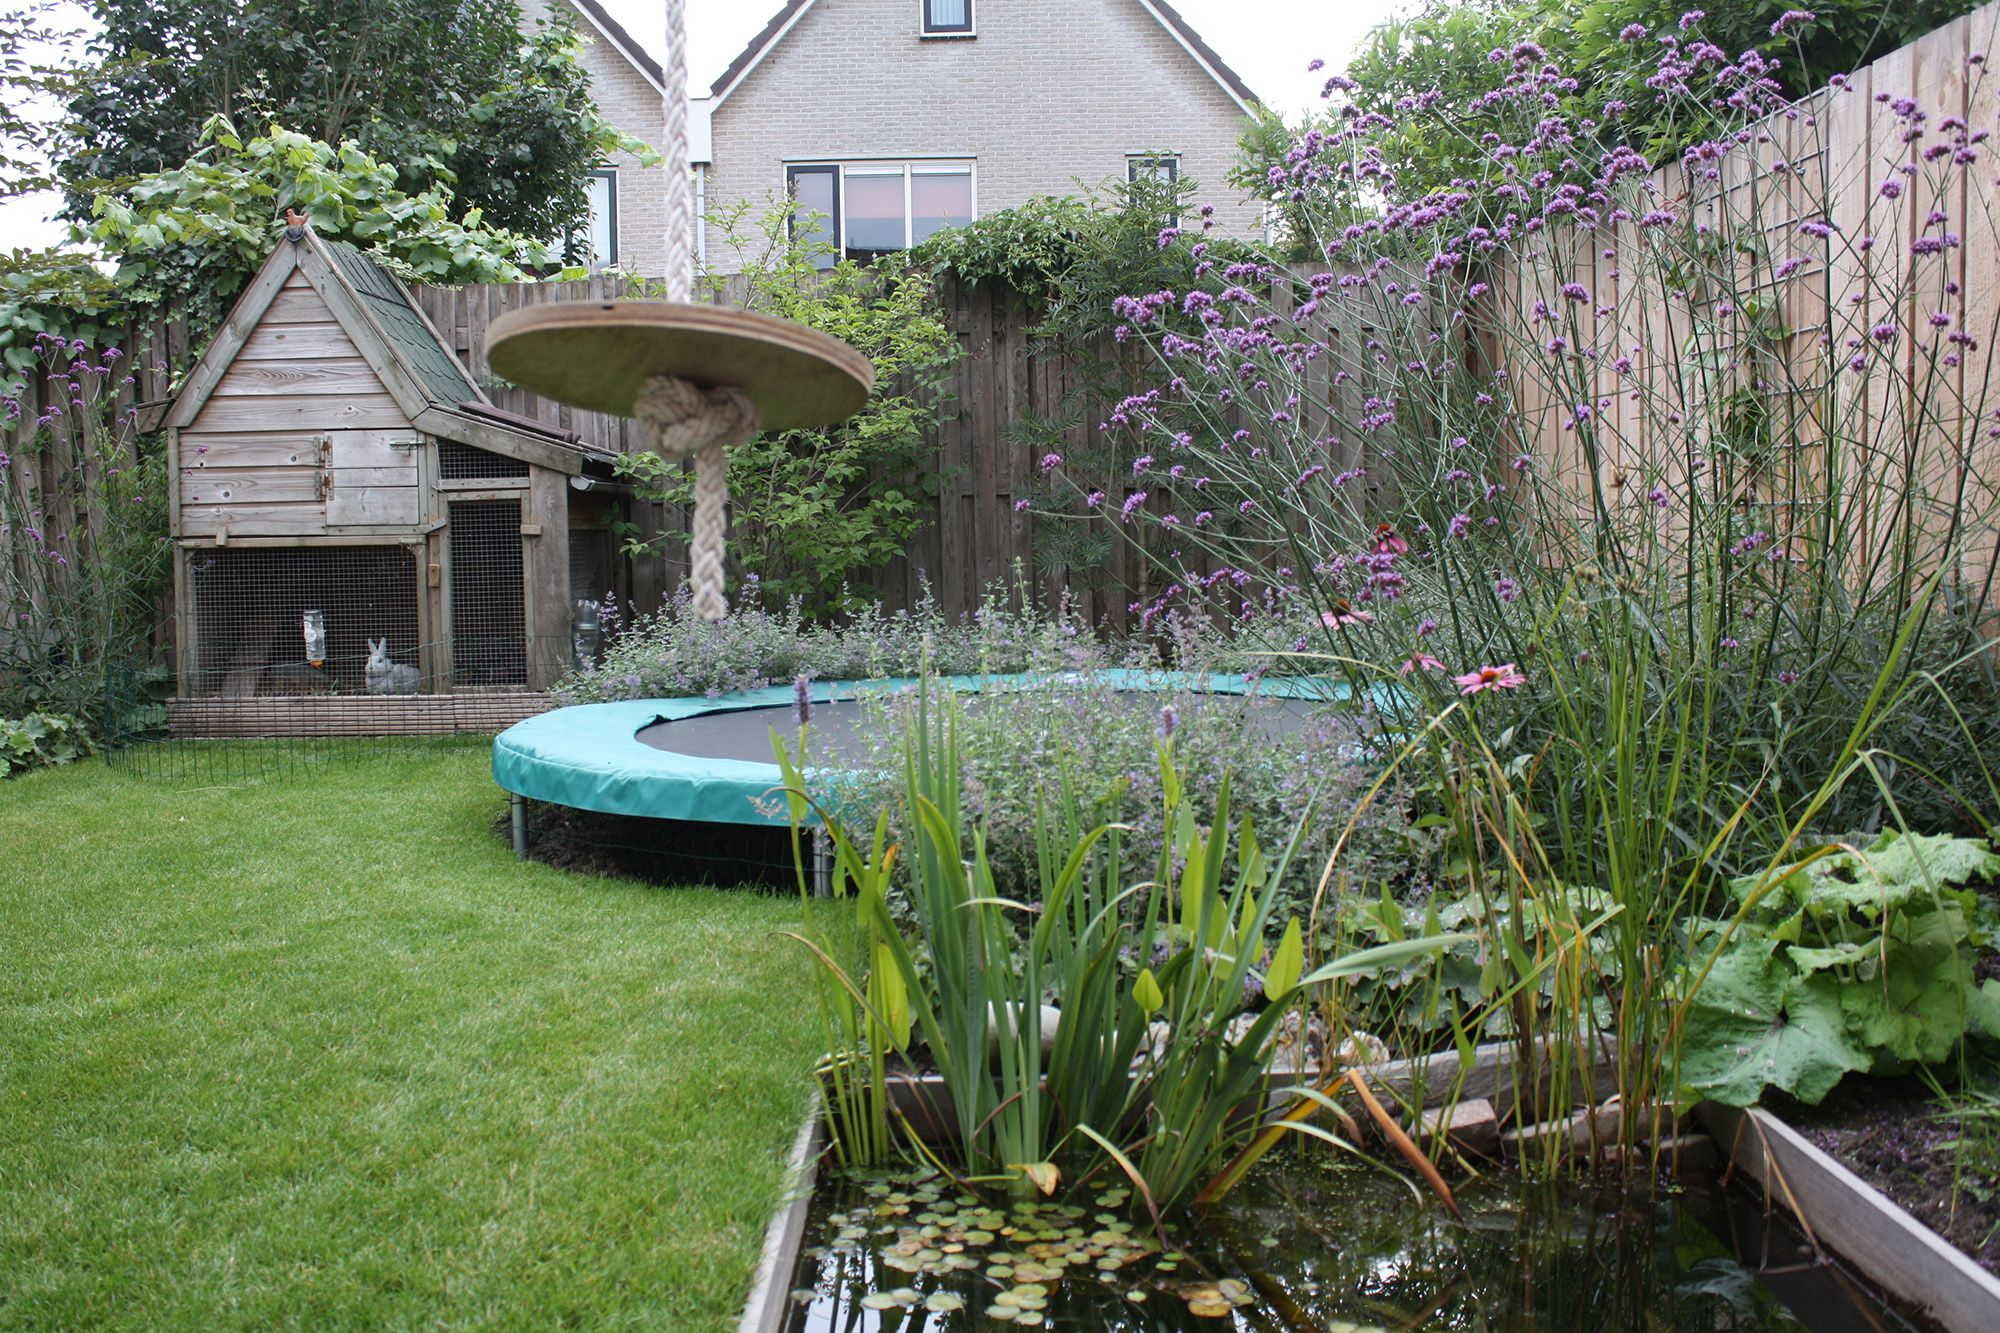 Trampoline Kleine Tuin : Afbeeldingsresultaat voor kleine tuin met trampoline trampoline